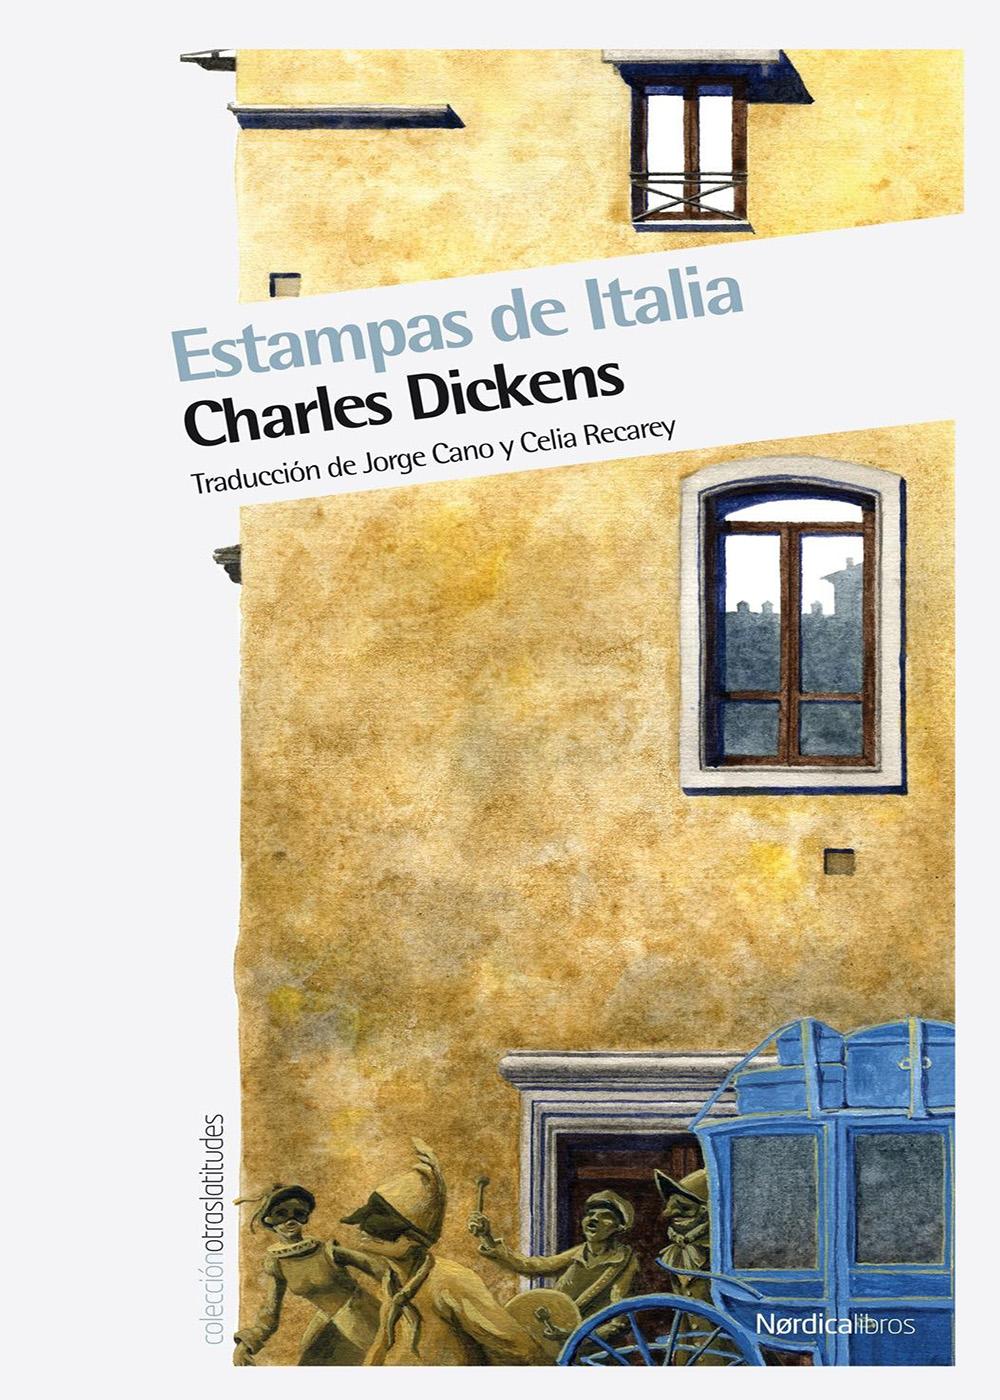 Charles Dickens - Estampas de Italia